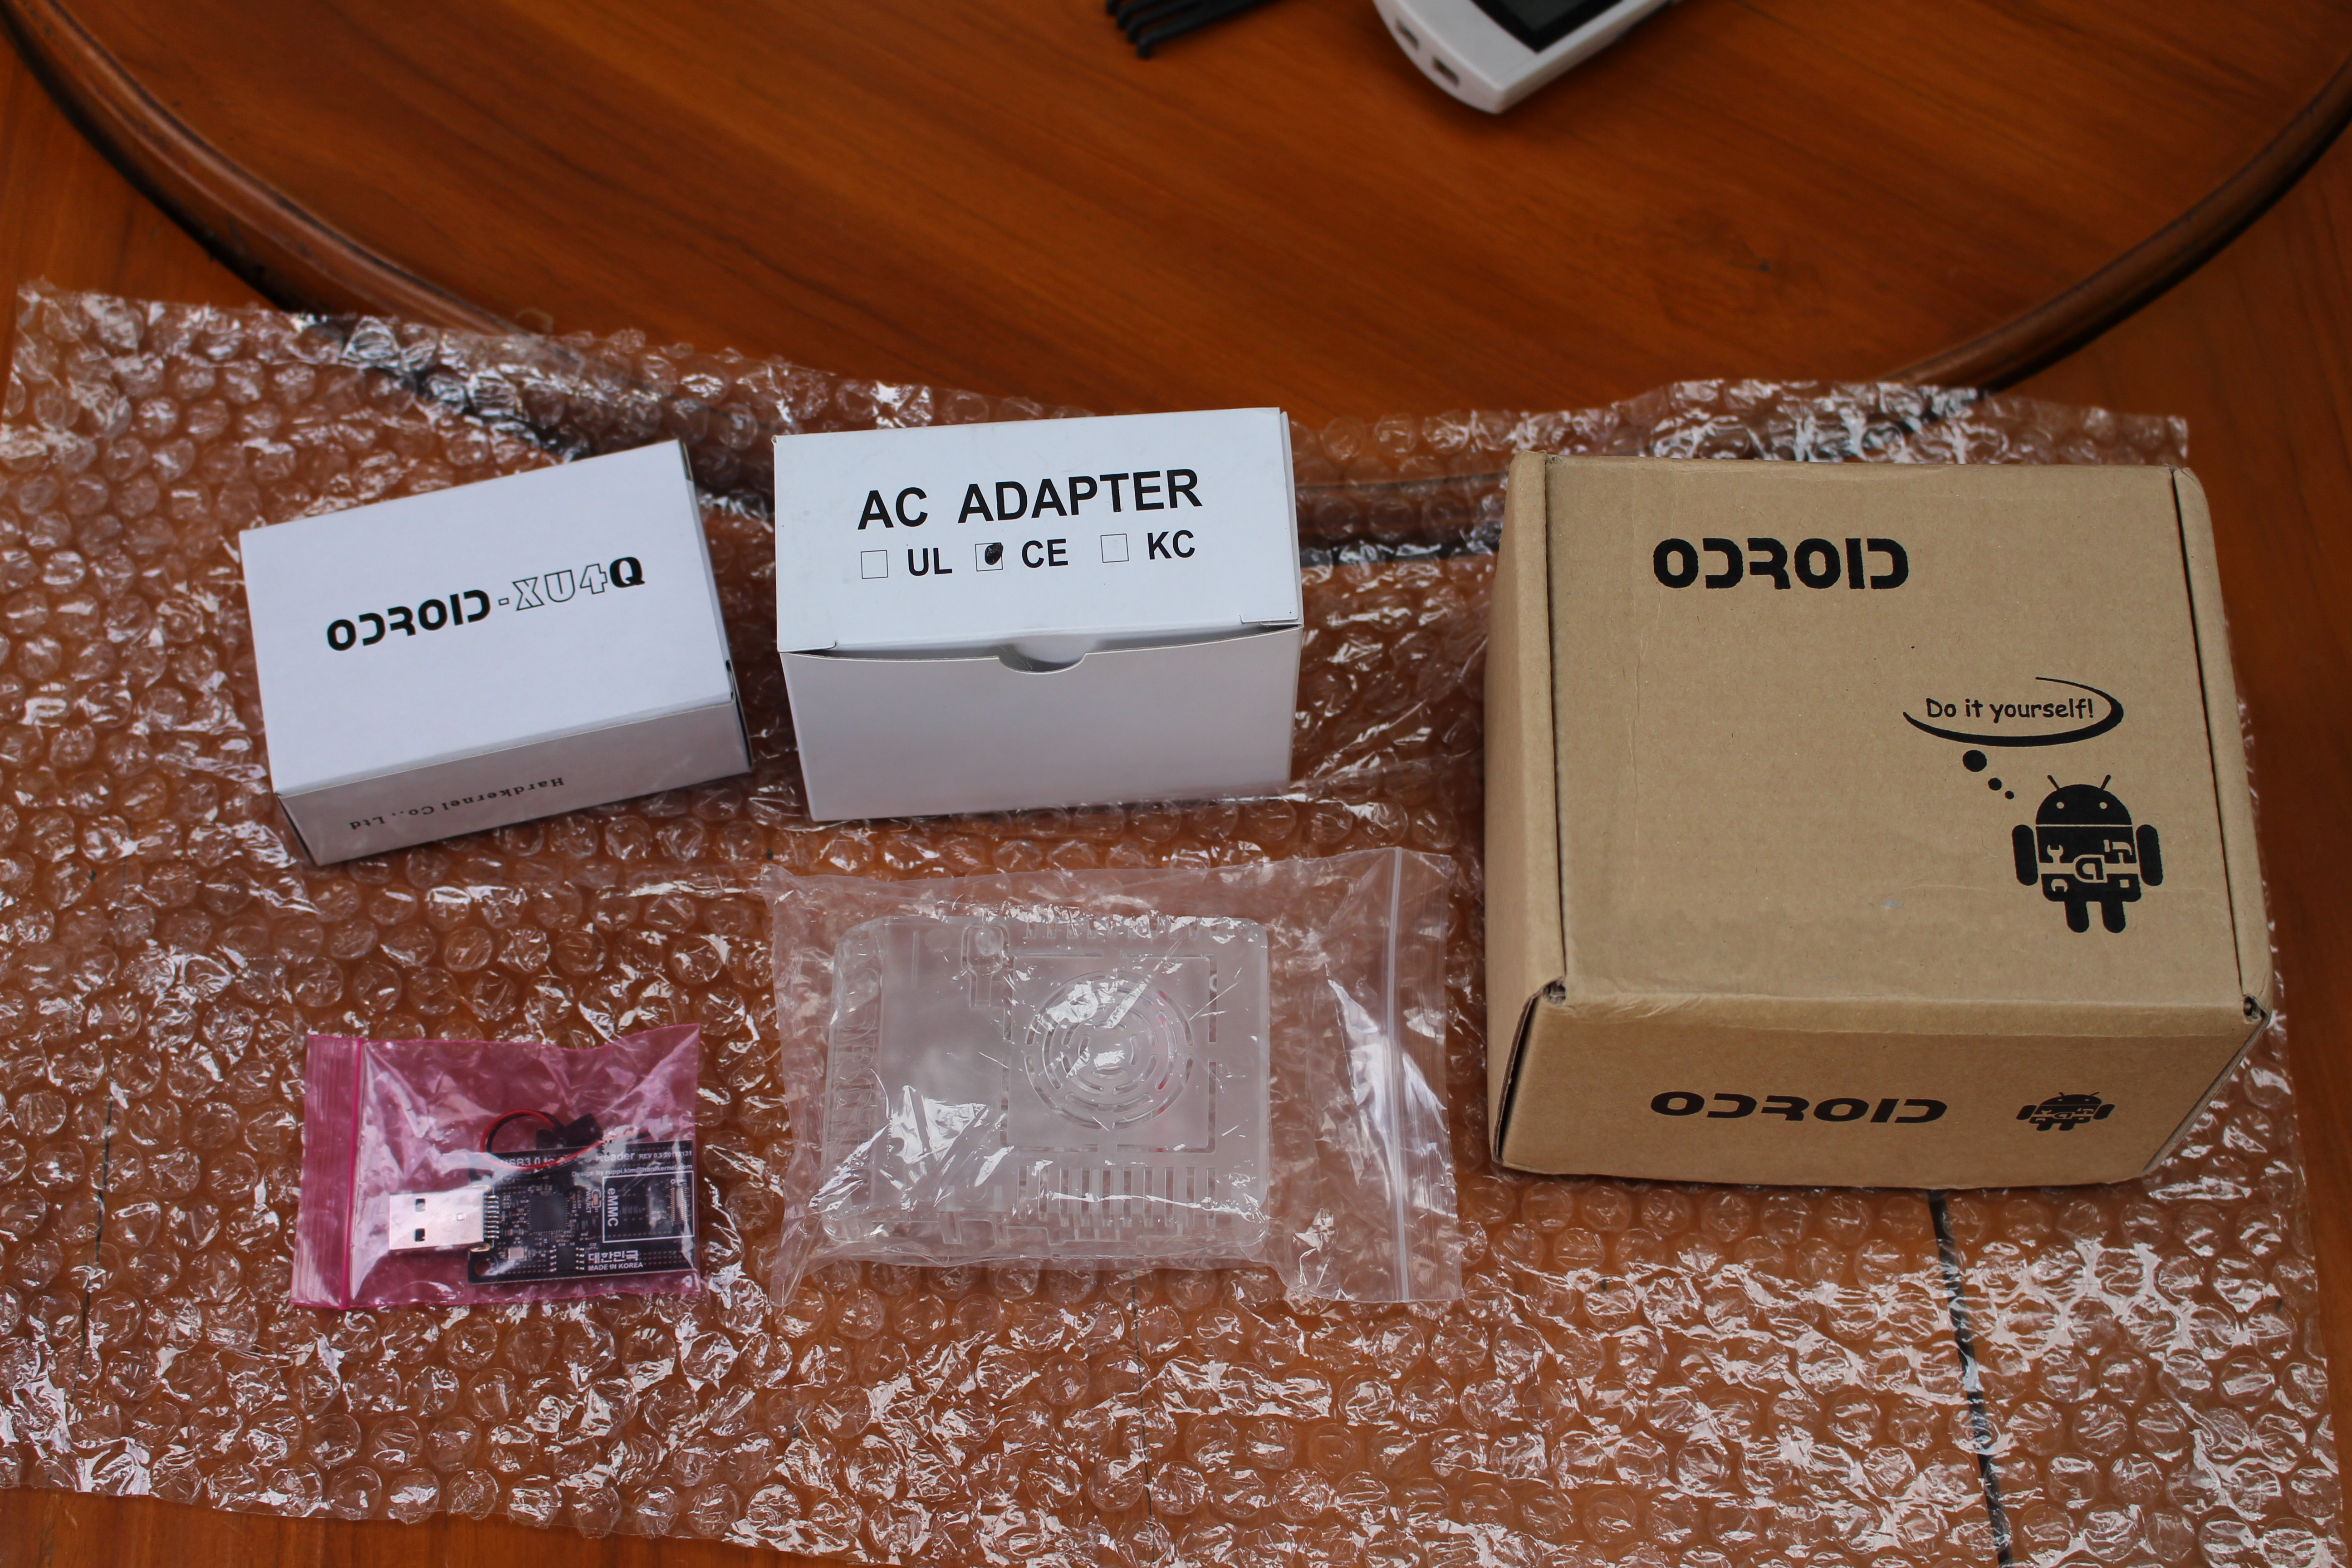 Review Of Ubuntu 1804 On Odroid Xu4q Development Board C1 Wiringpi Click To Enlarge